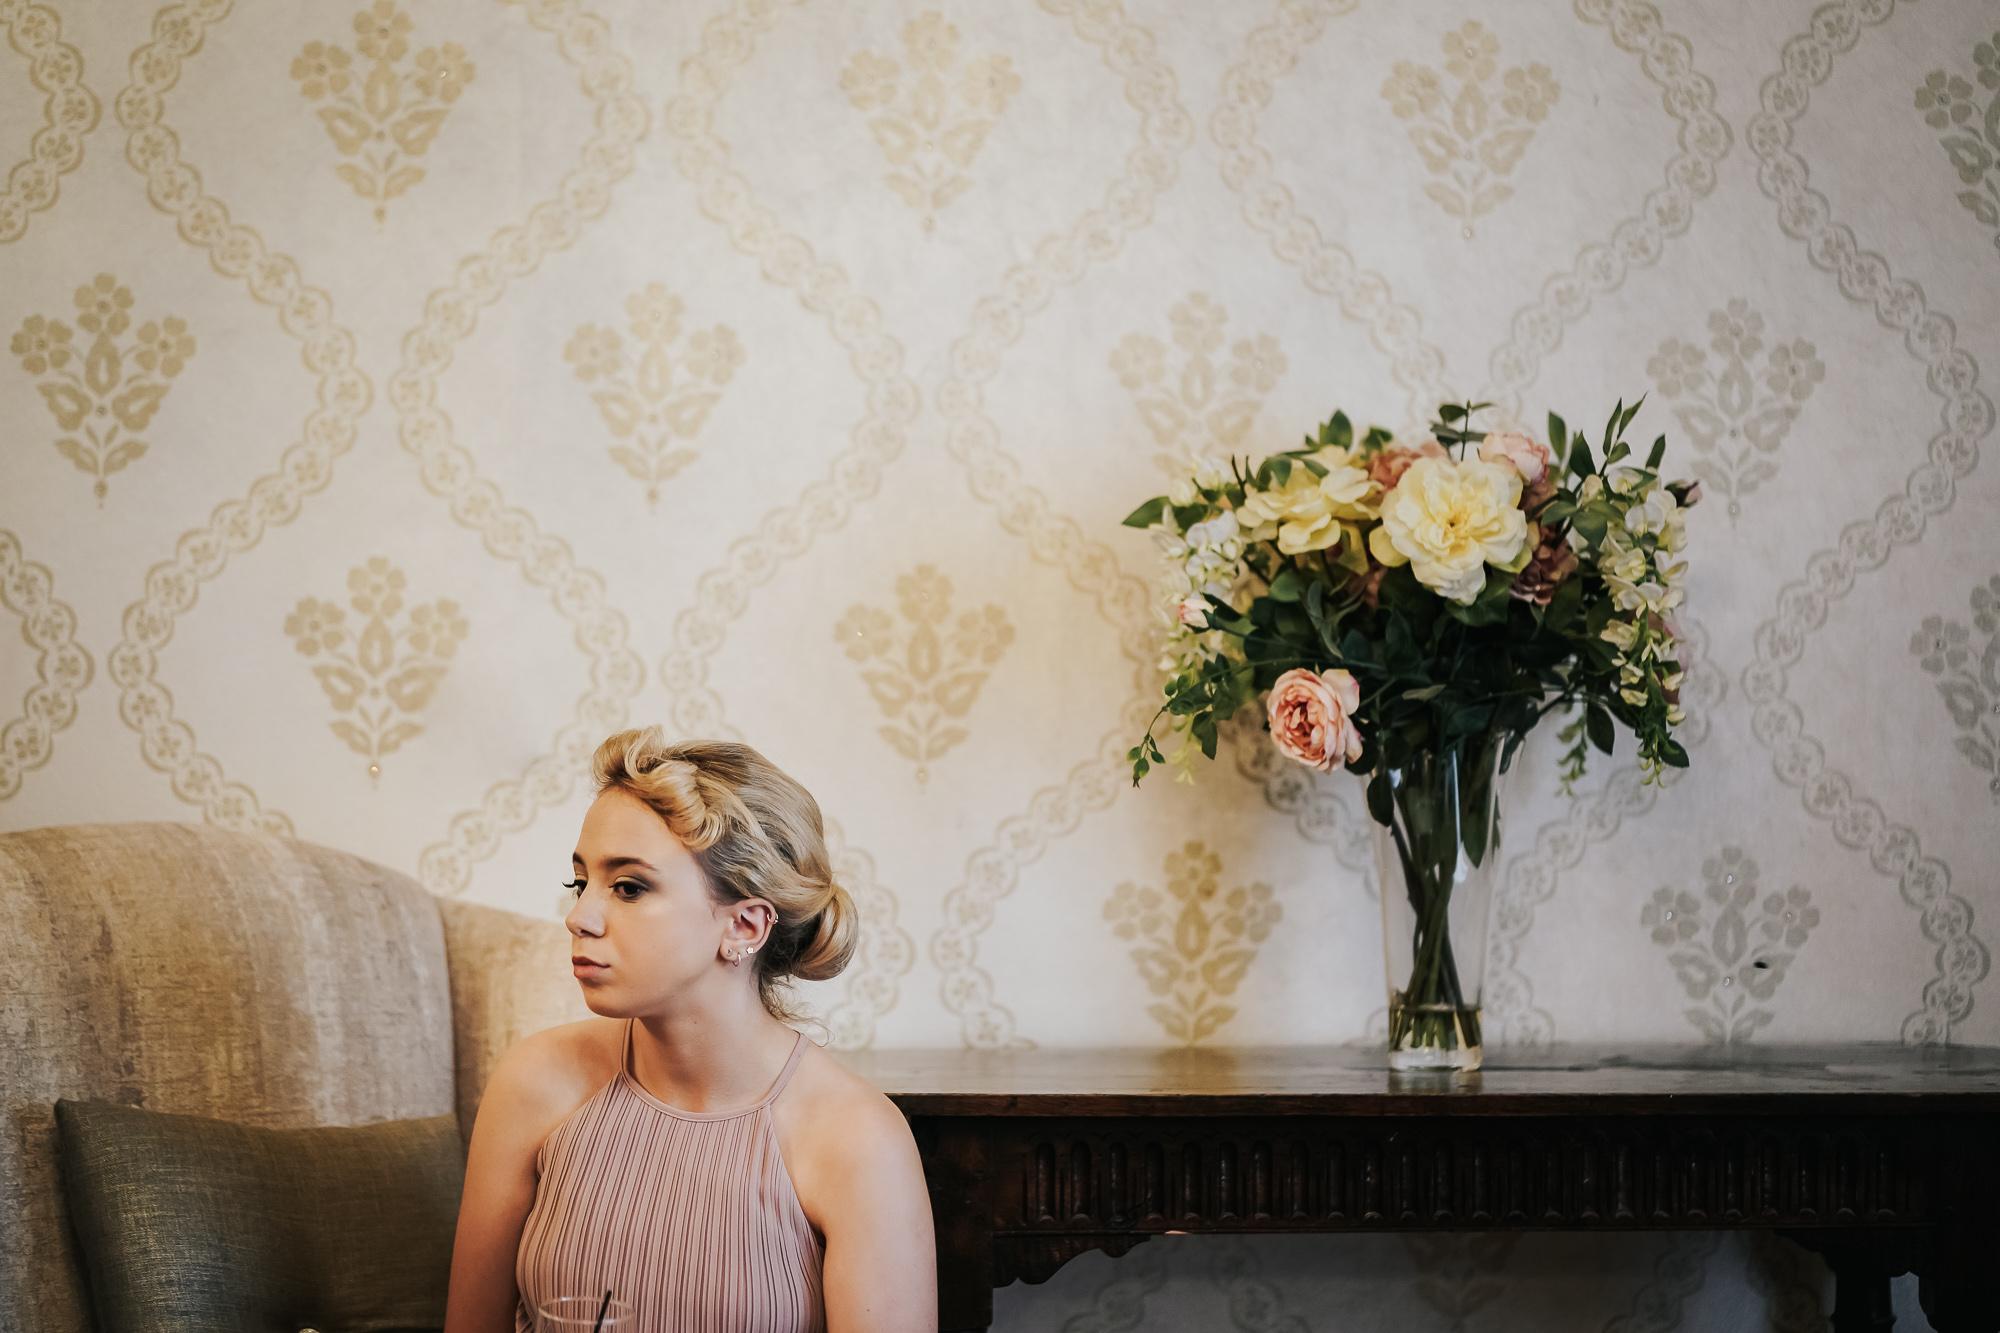 West Tower Wedding Venue Orkskirk Lancashire Wedding Photography cheshire wedding photographer (5 of 47).jpg